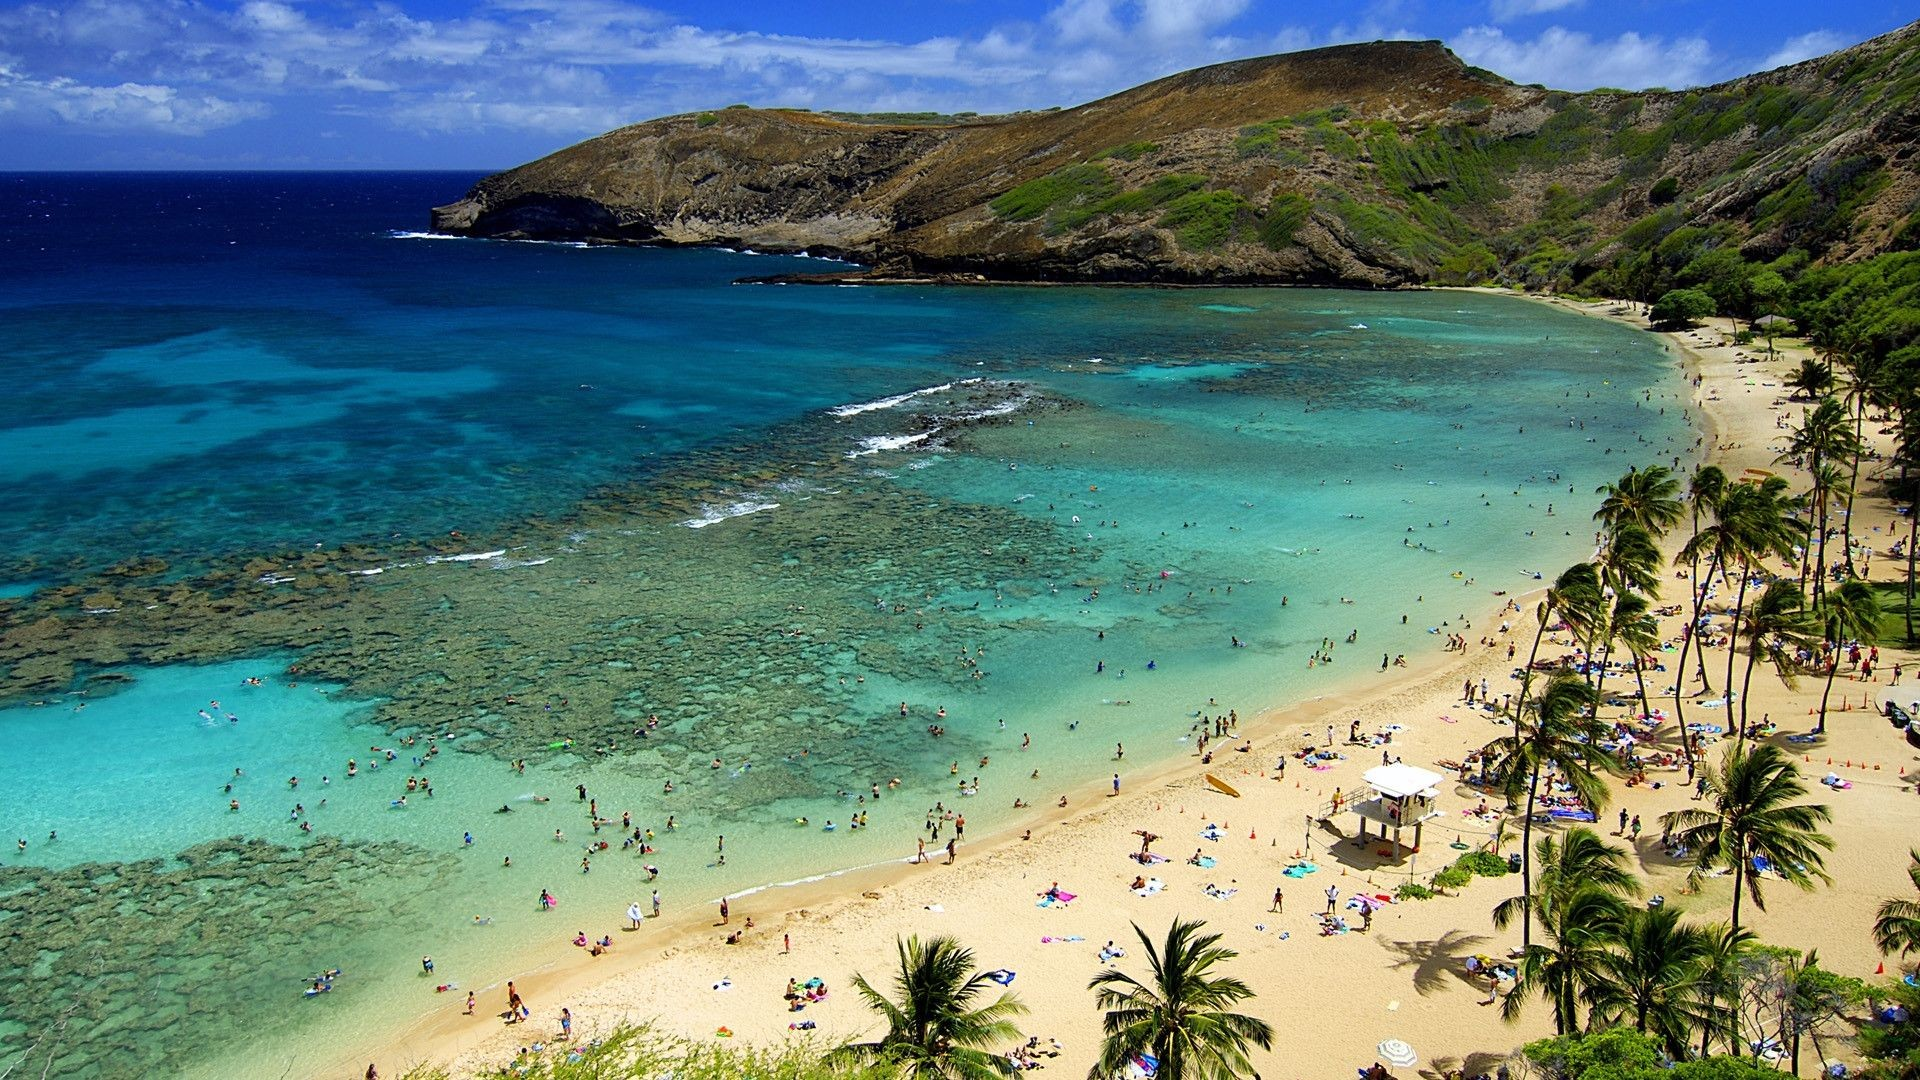 Free Desktop Hawaii Wallpapers.